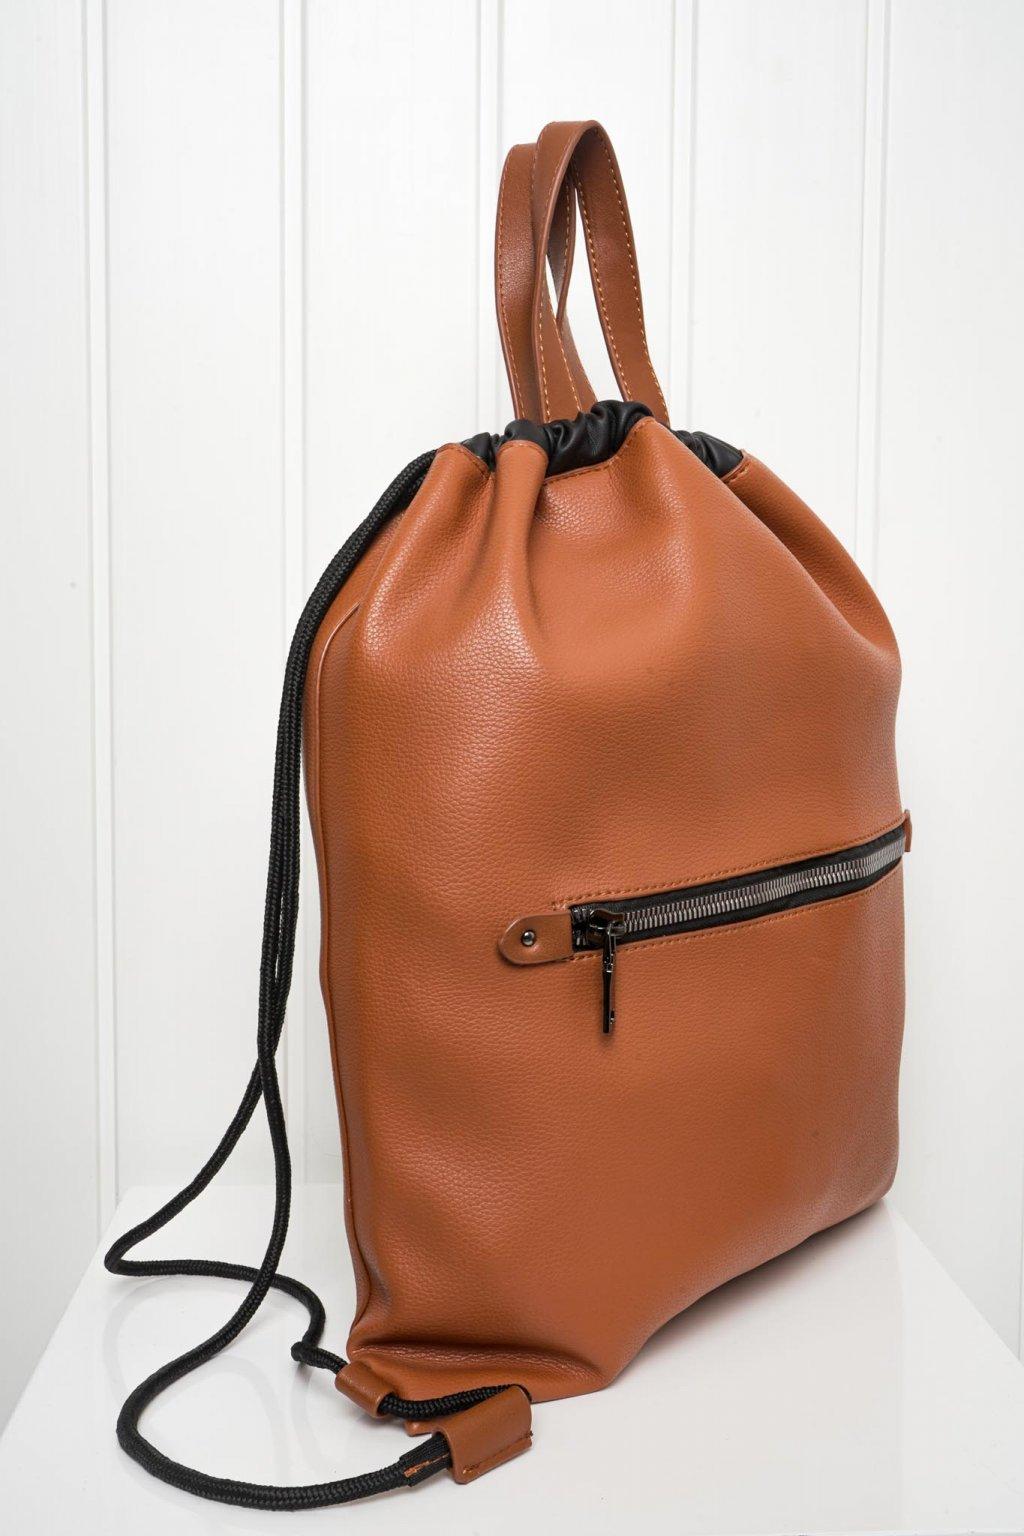 Kabelka, crossbody, ruksak, shopping bag, shopperka, 444